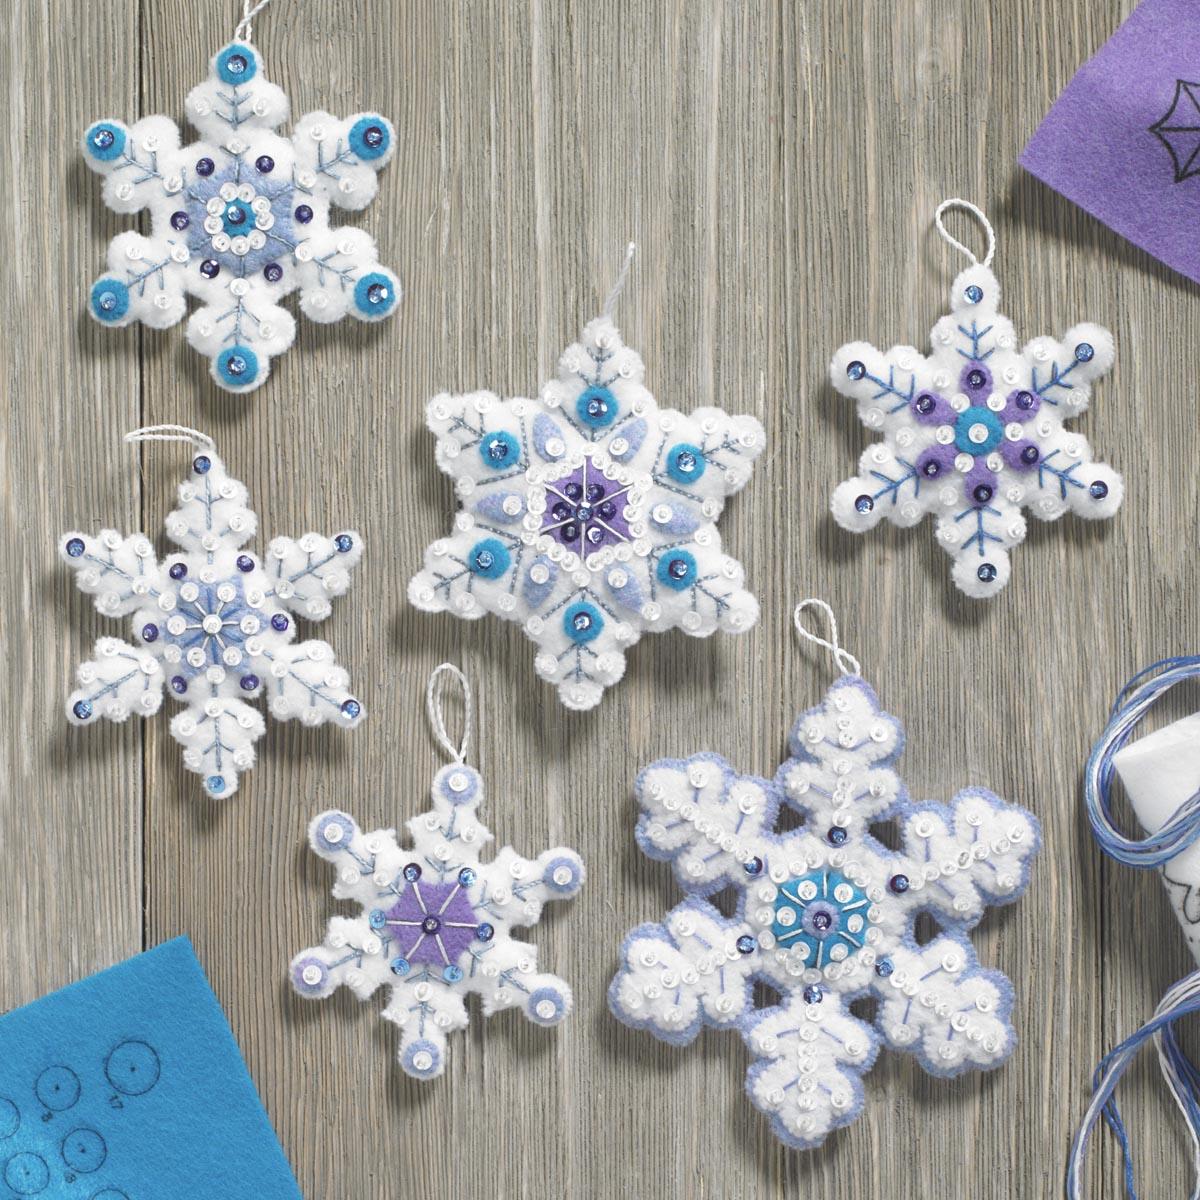 Bucilla ® Seasonal - Felt - Ornament Kits - Sparkle Snowflakes